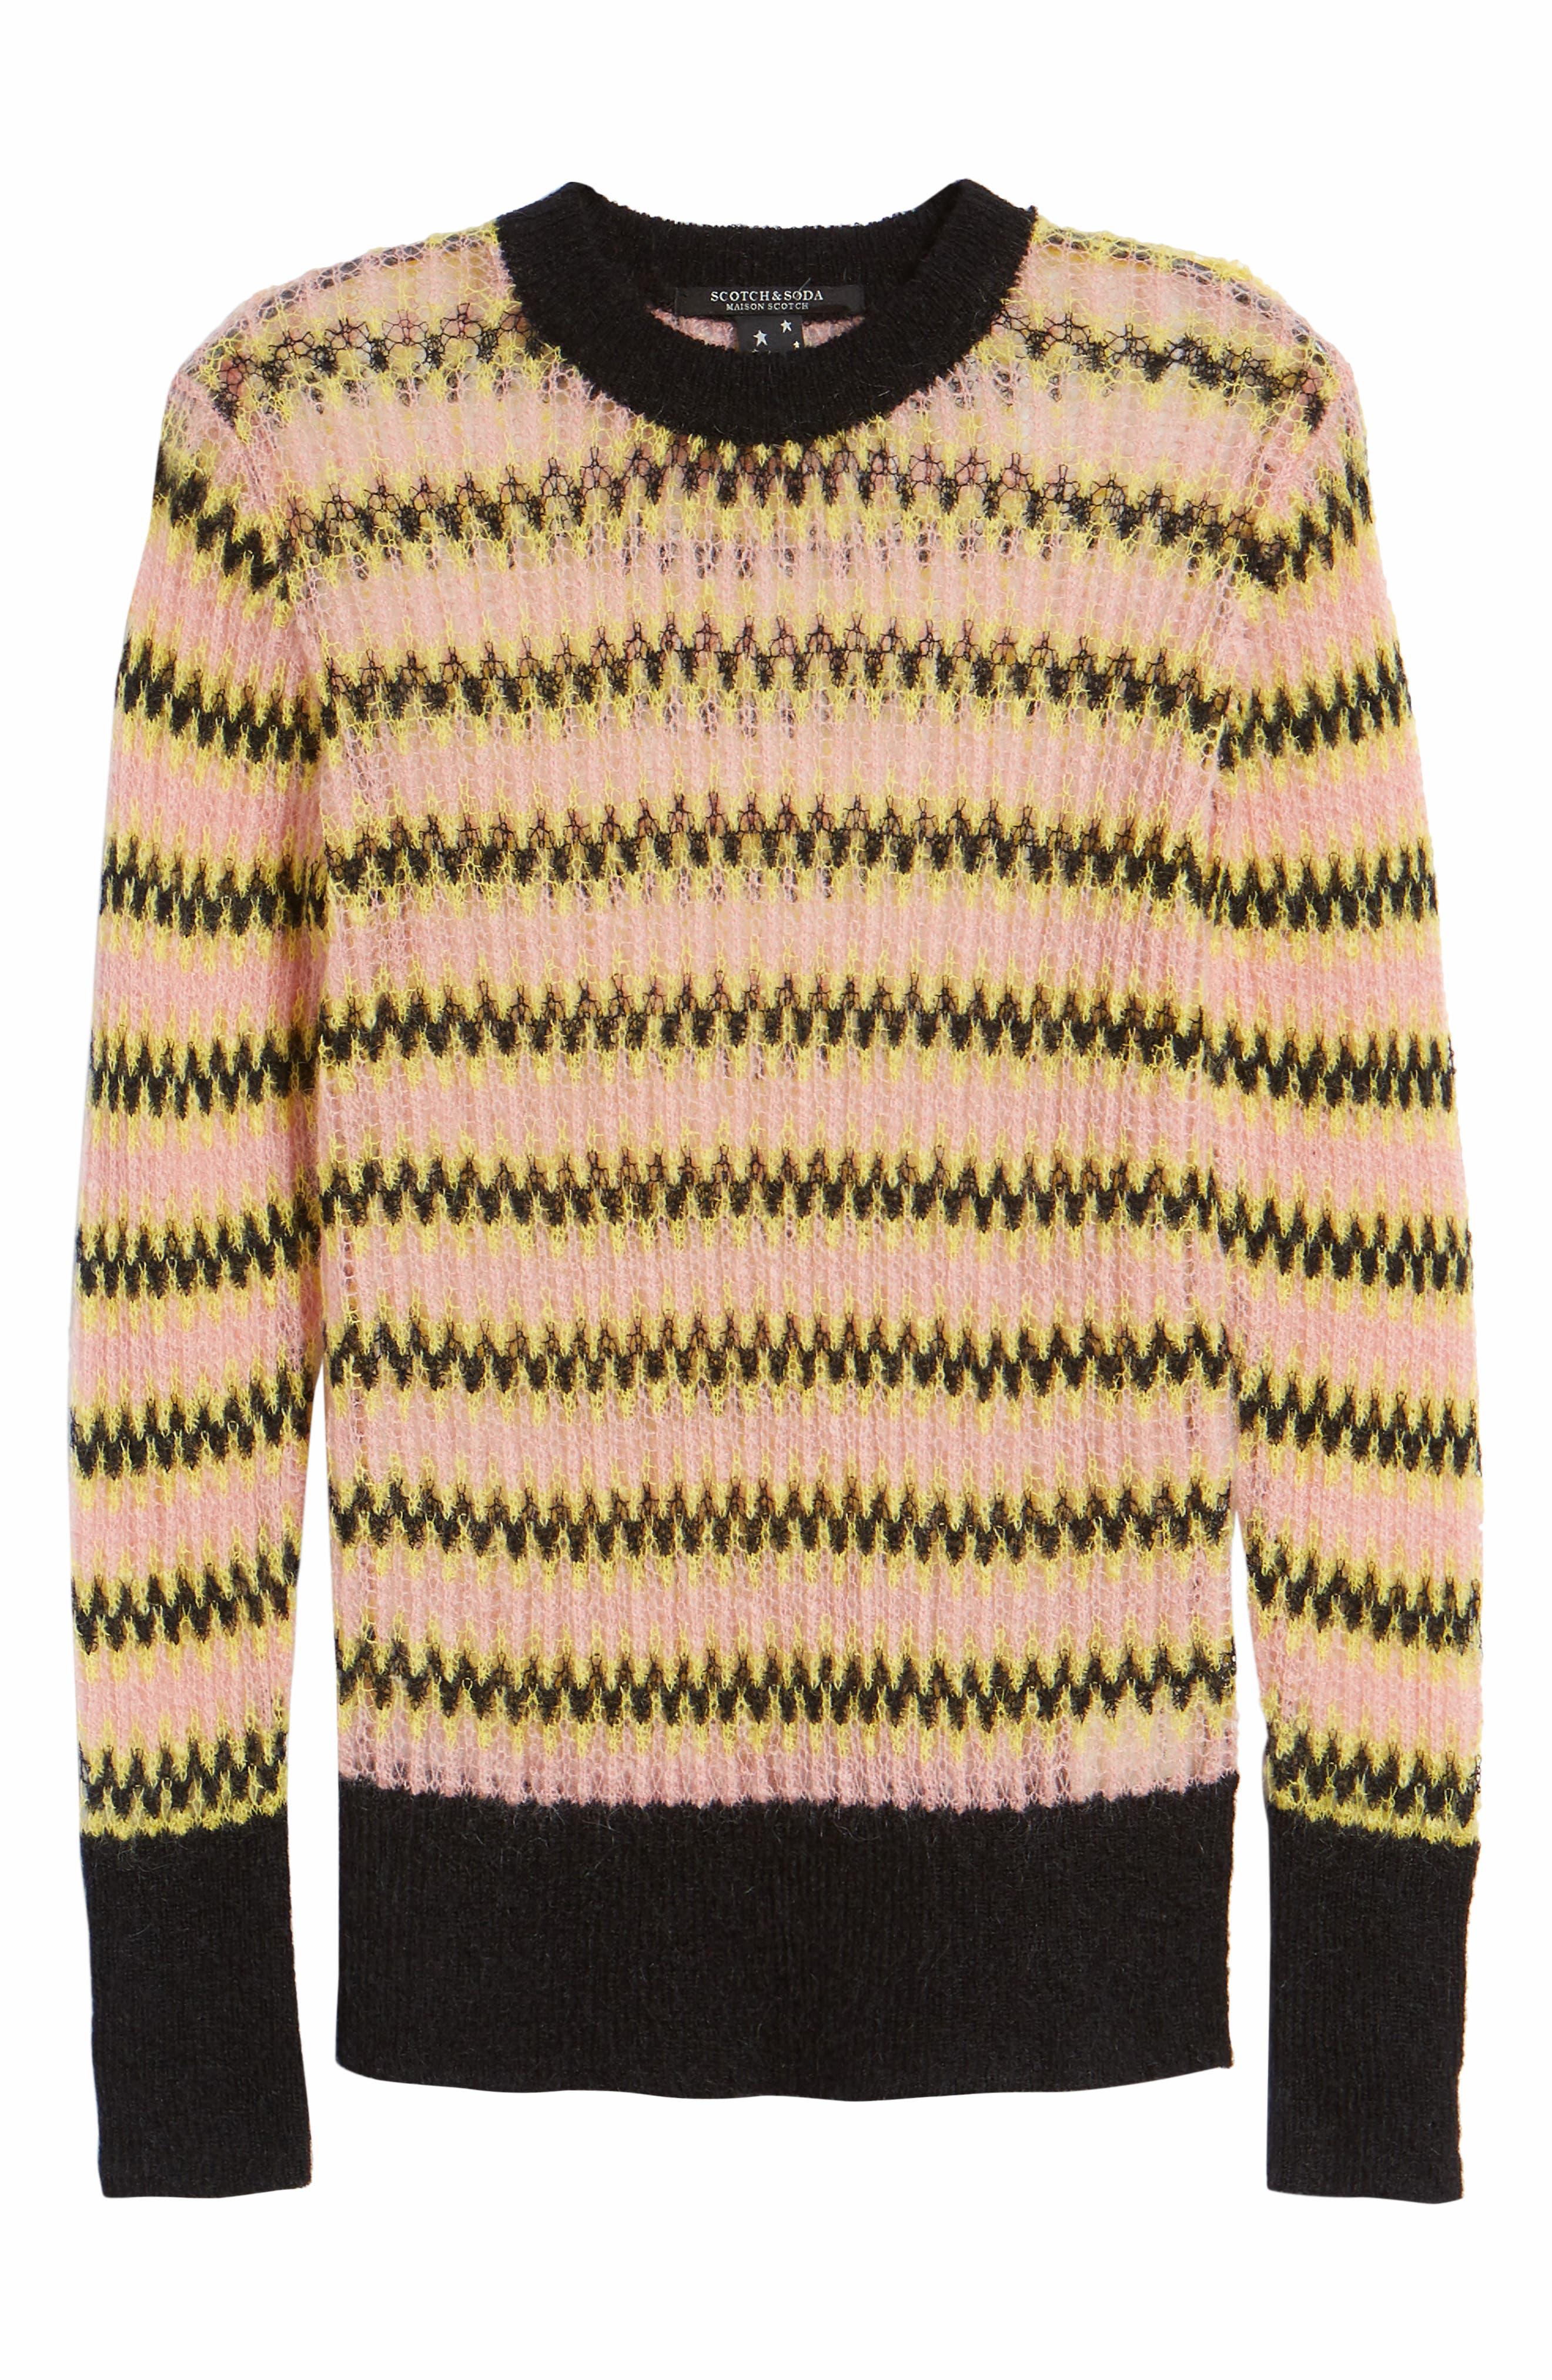 Zig Zag Wool Blend Sweater,                             Alternate thumbnail 6, color,                             MULTI PINK YELLOW ZIGZAG PRINT